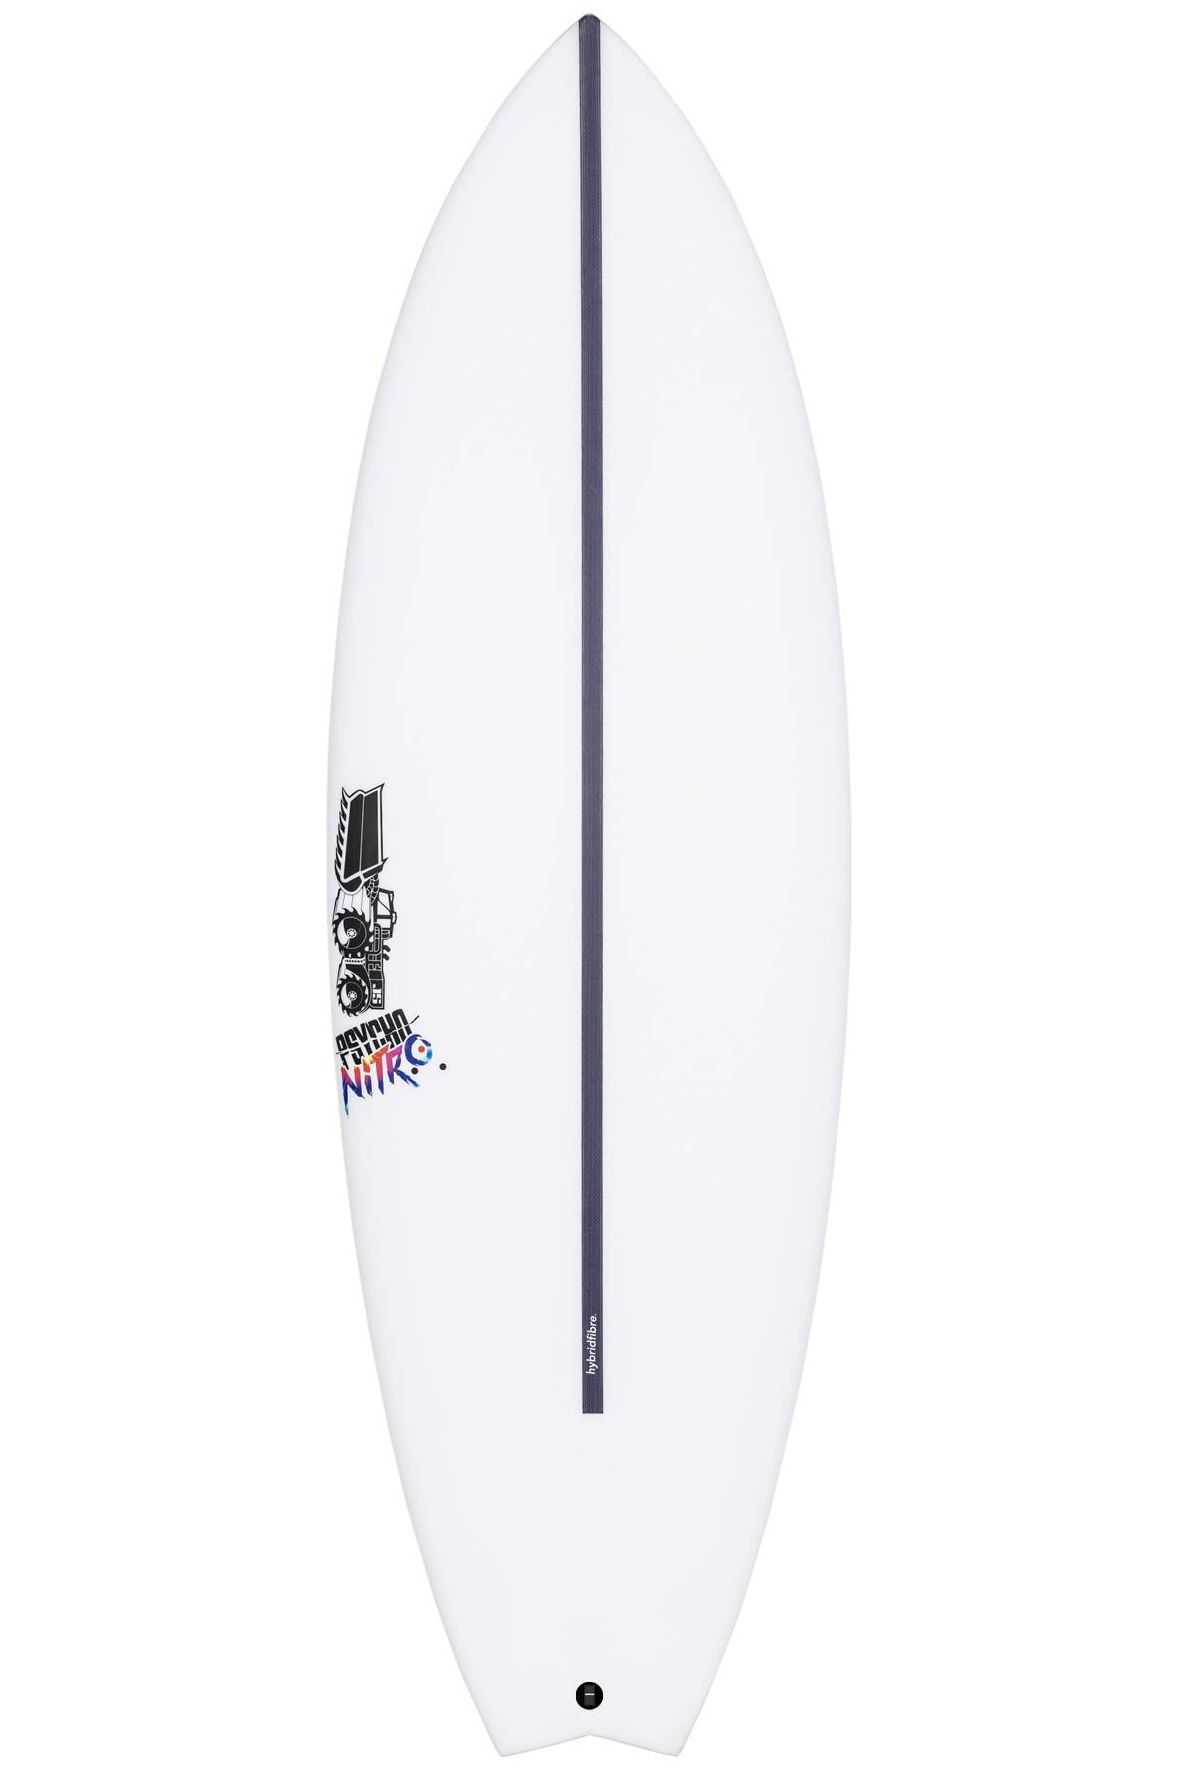 Prancha Surf JS 5'4 PSYCHO NITRO HYFI Swallow Tail - White FCS II Multisystem 5ft4